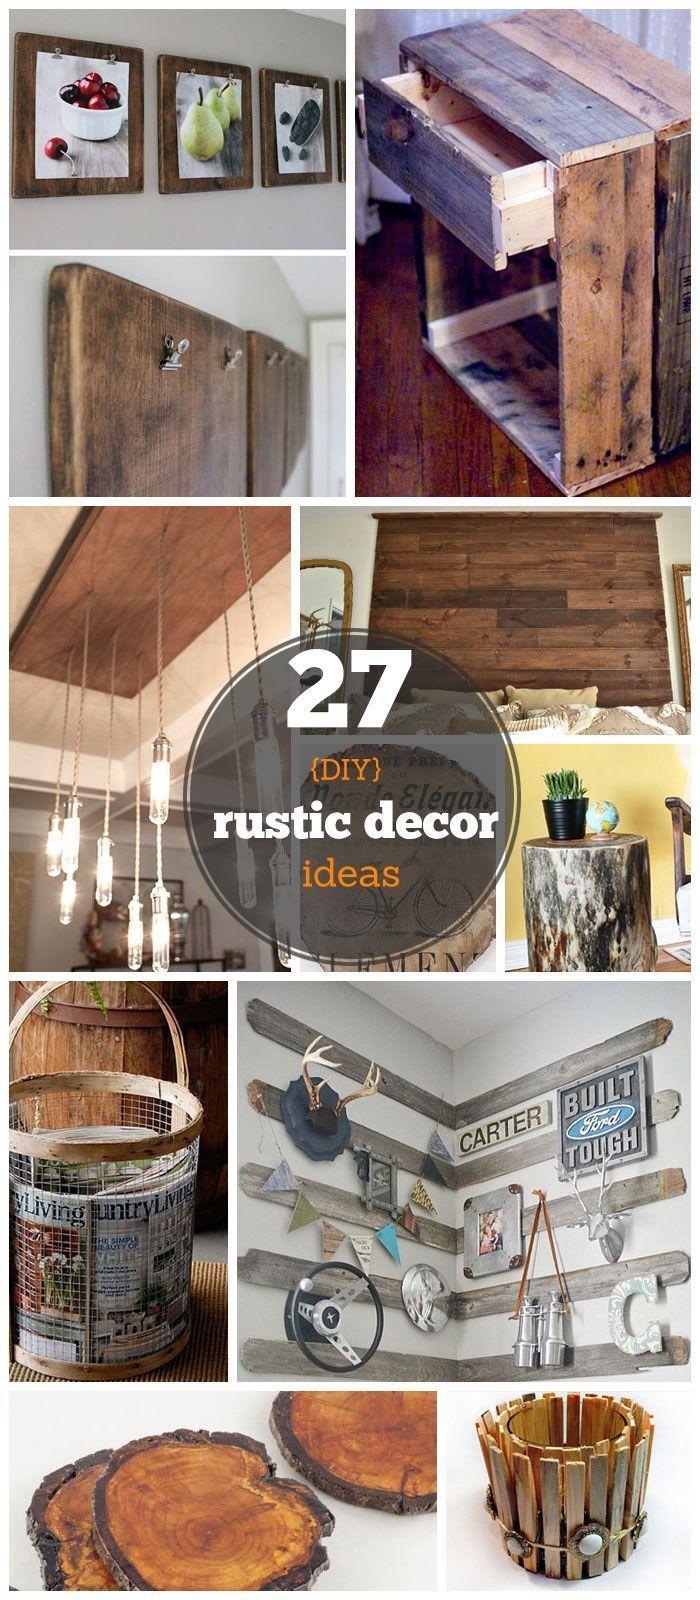 17 Diy Rustic Home Decor Ideas For Living Room: 17 Best Ideas About Rustic Home Decorating On Pinterest